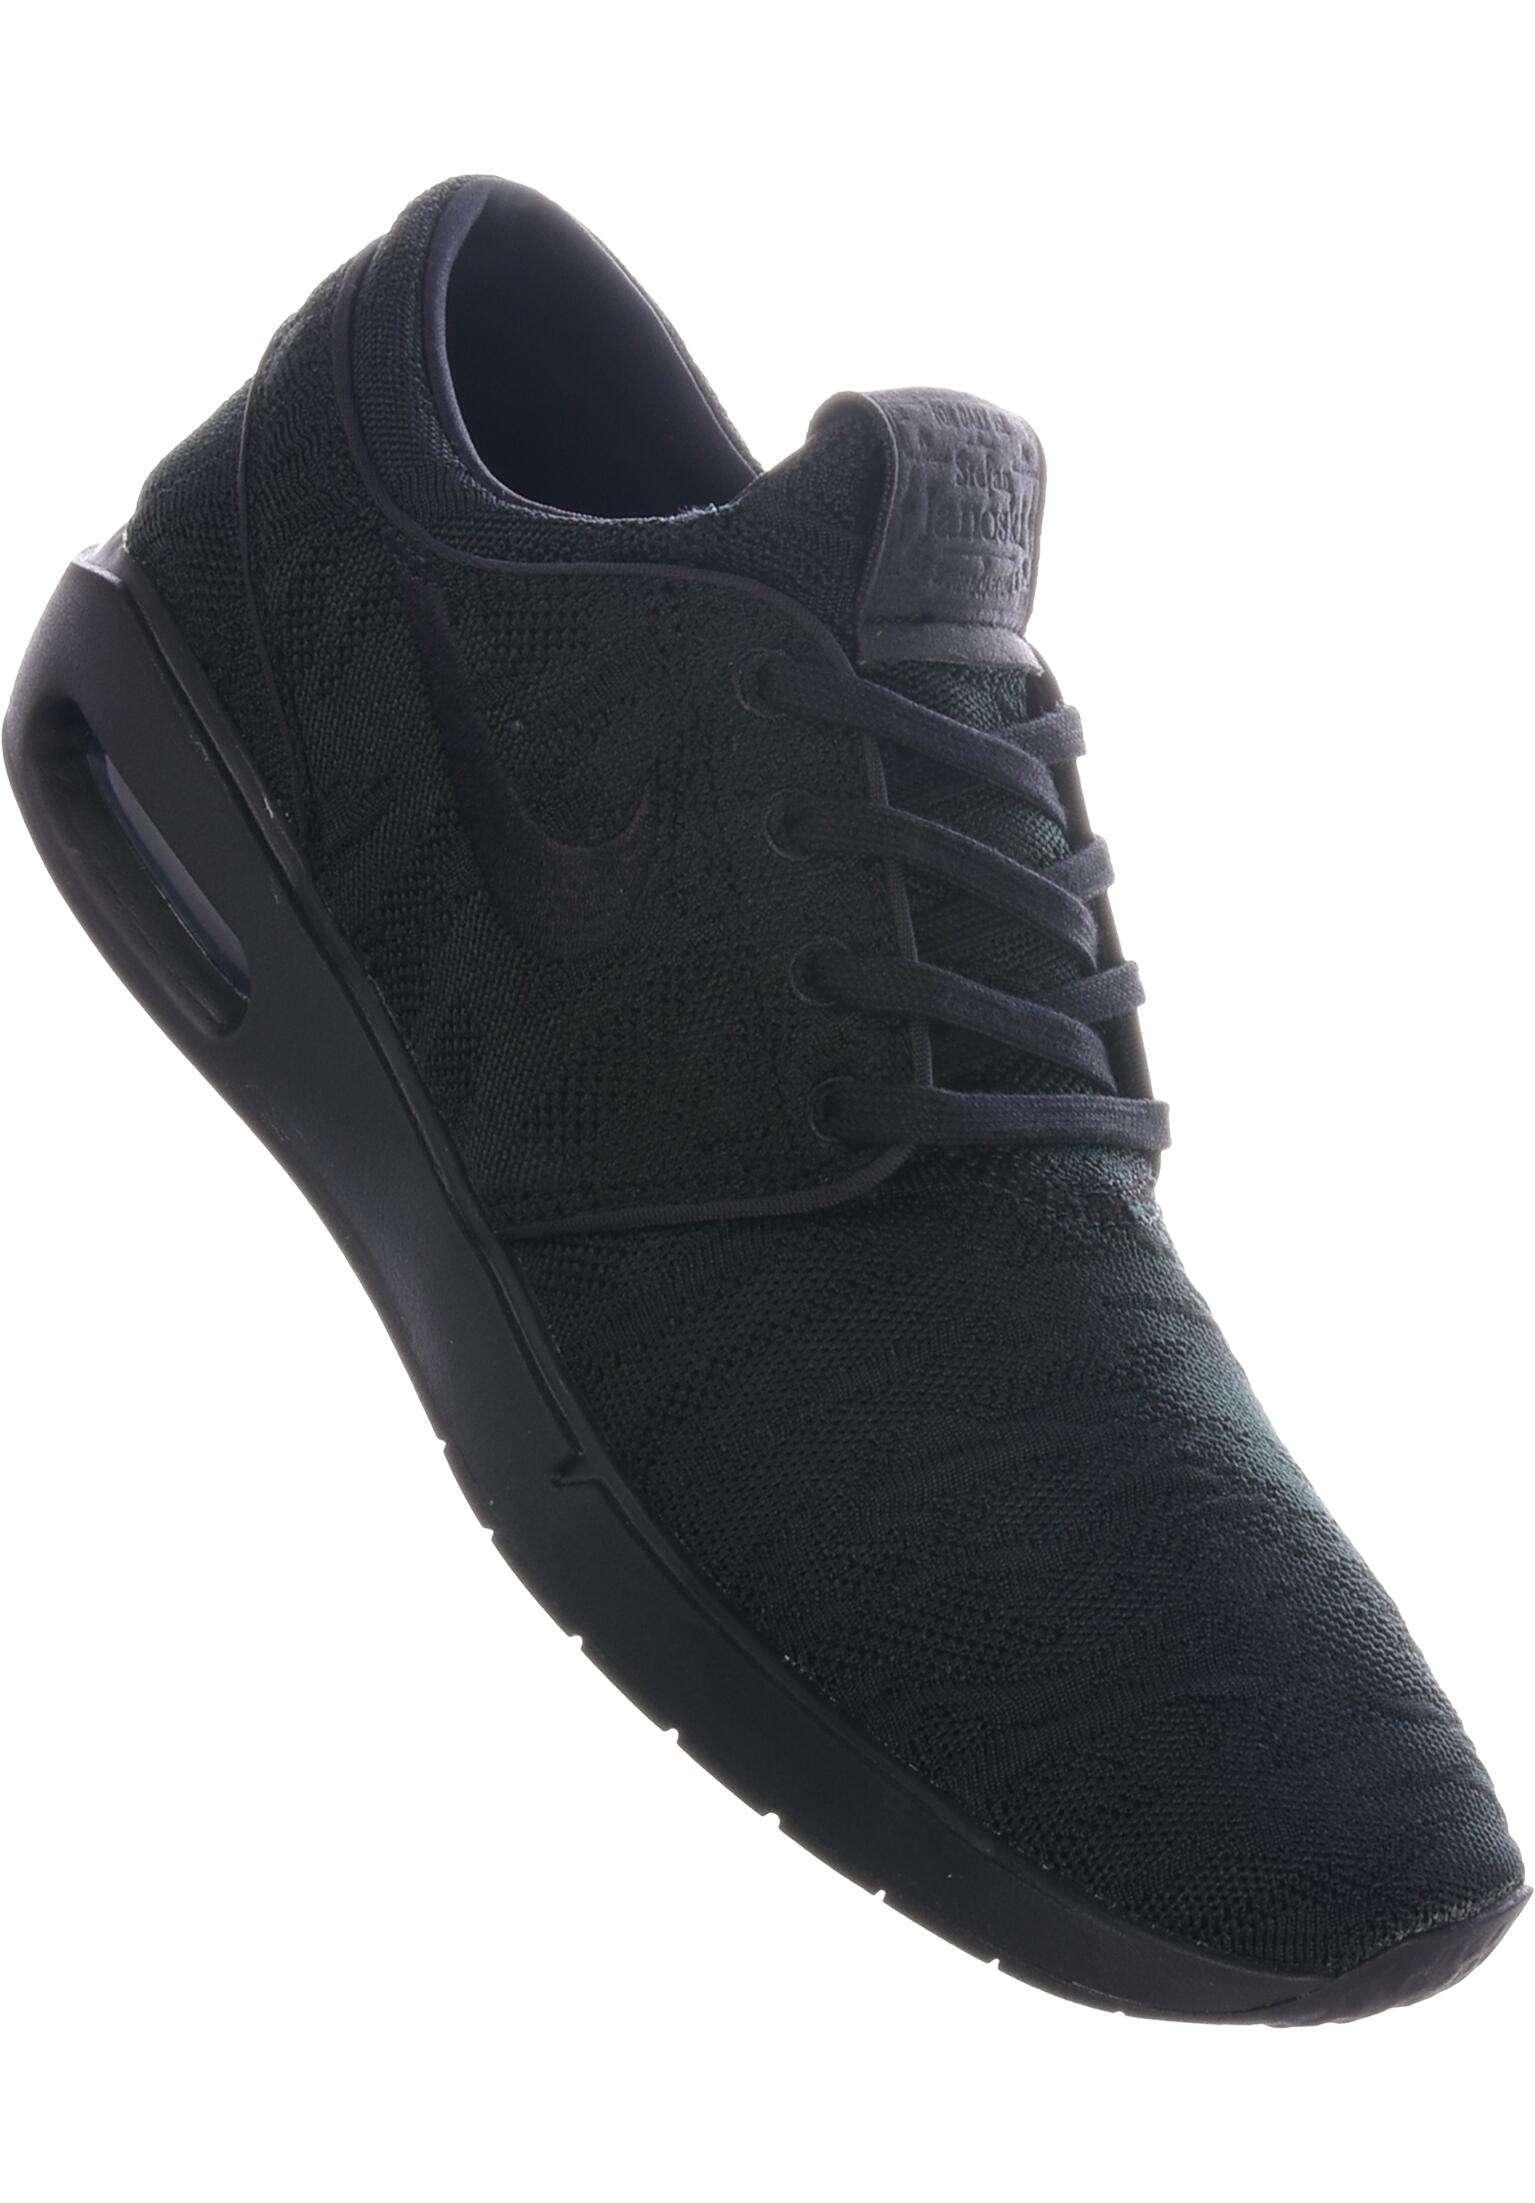 Nike SB Air Max Janoski 2 Shoes